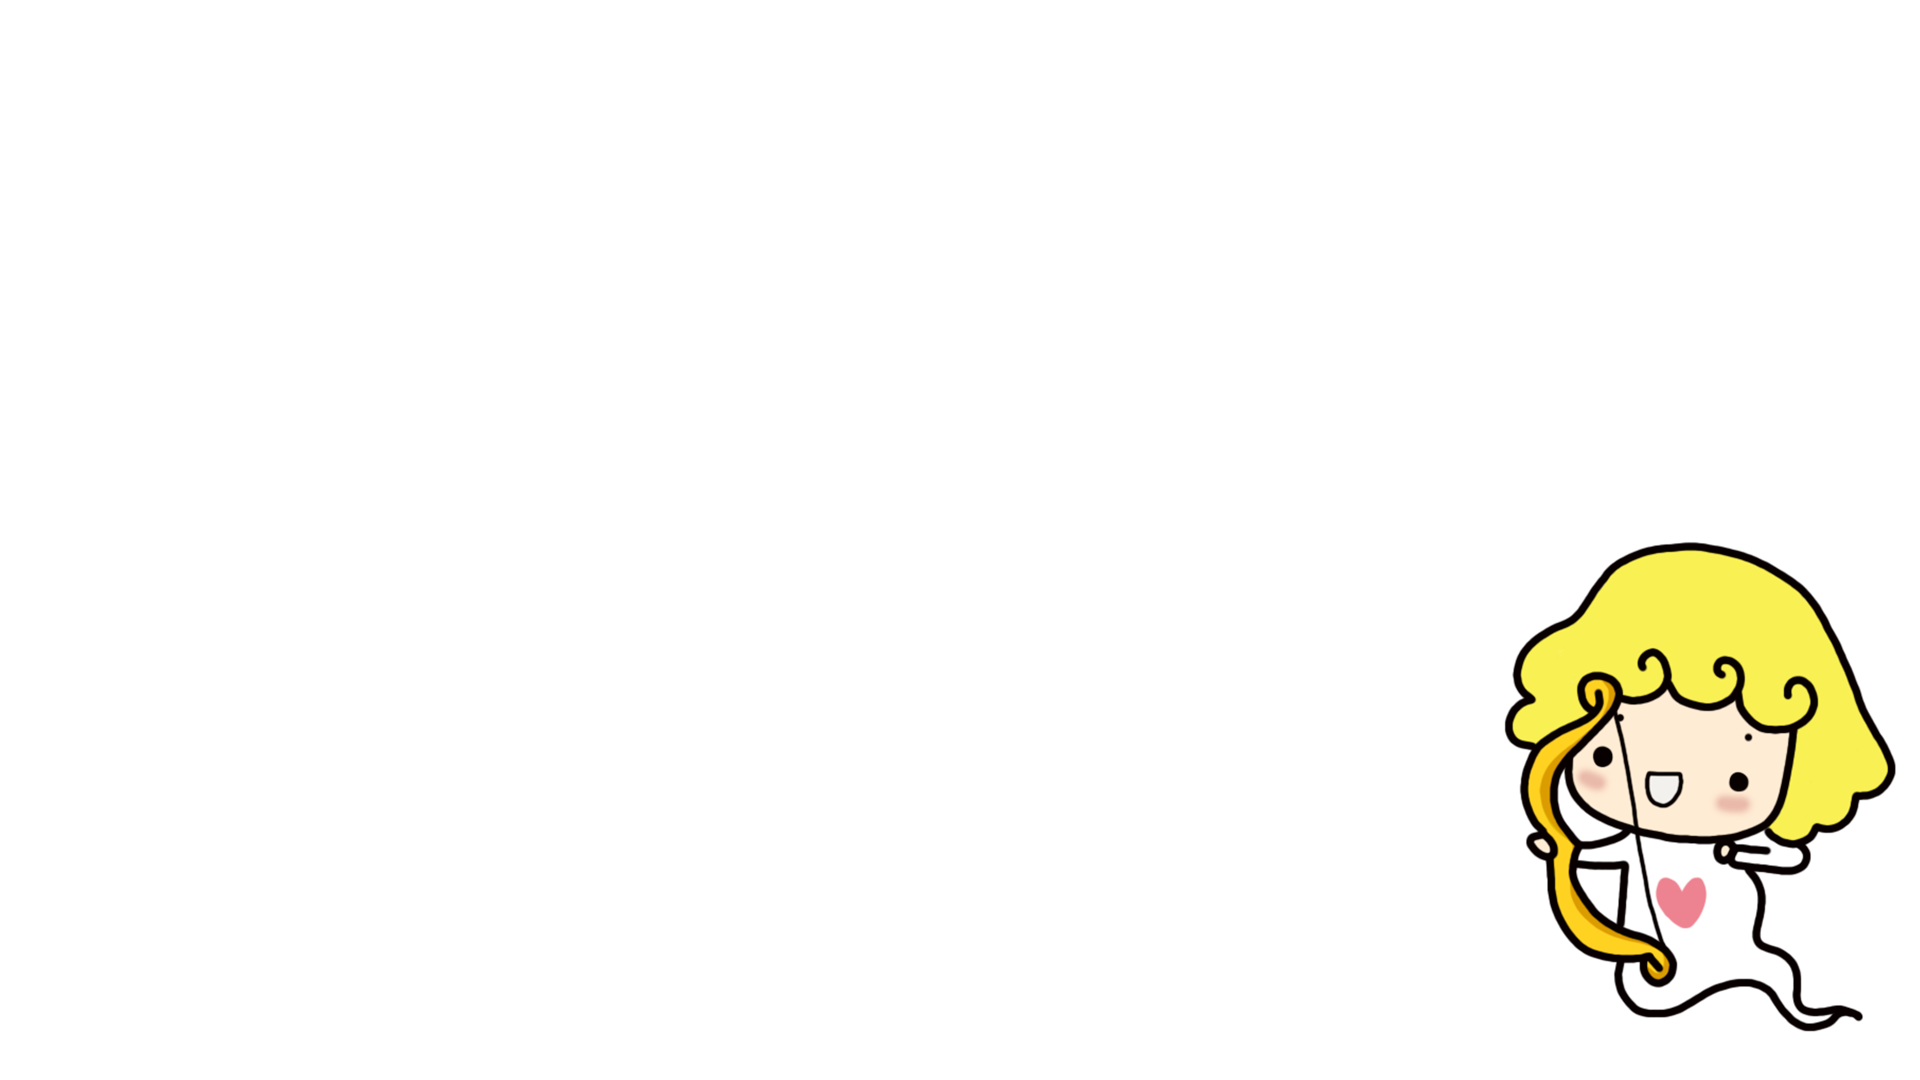 png透明水印素材152个,分辨率1920x1080 未分类